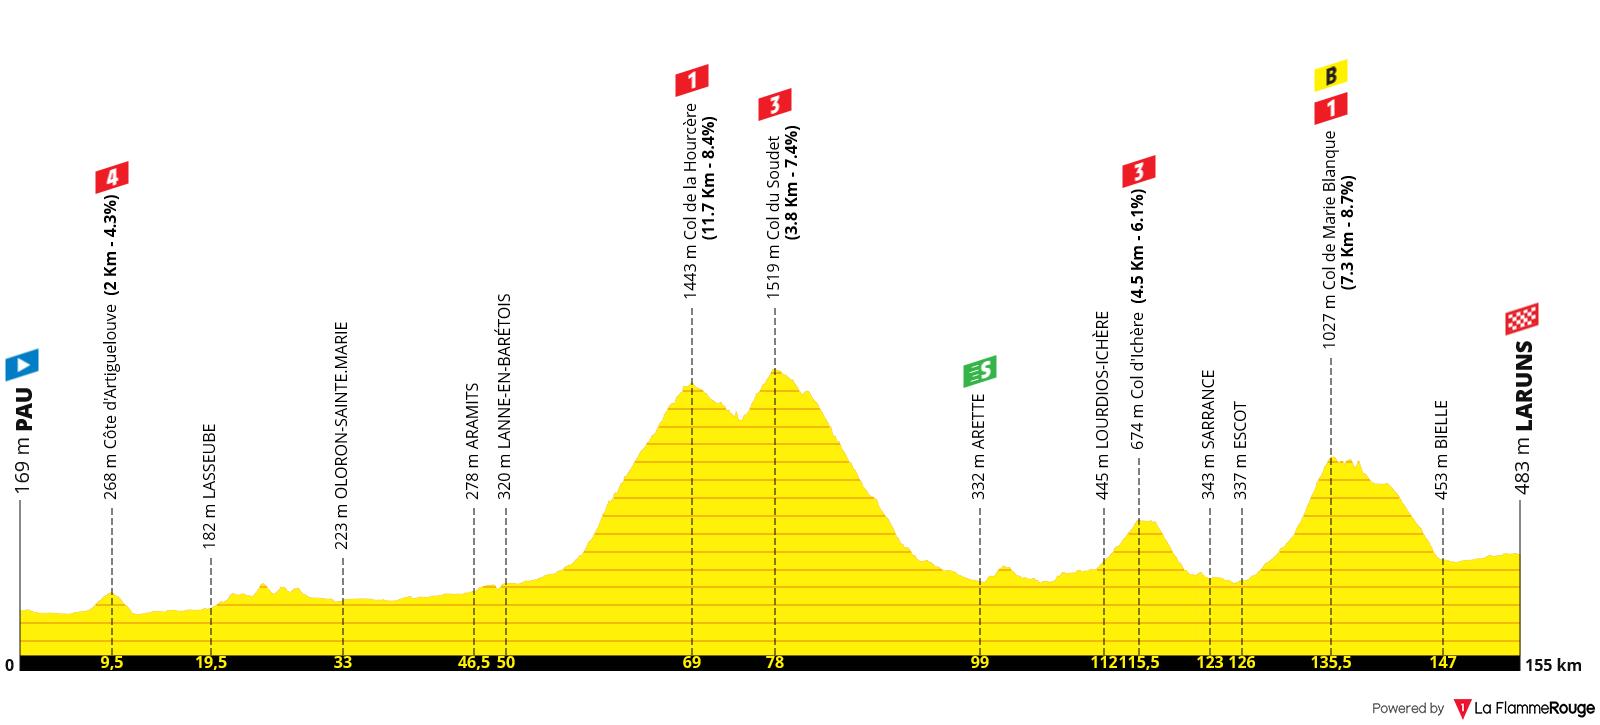 Perfil Etapa 09 - Tour de Francia 2020 - Pau Laruns 154km